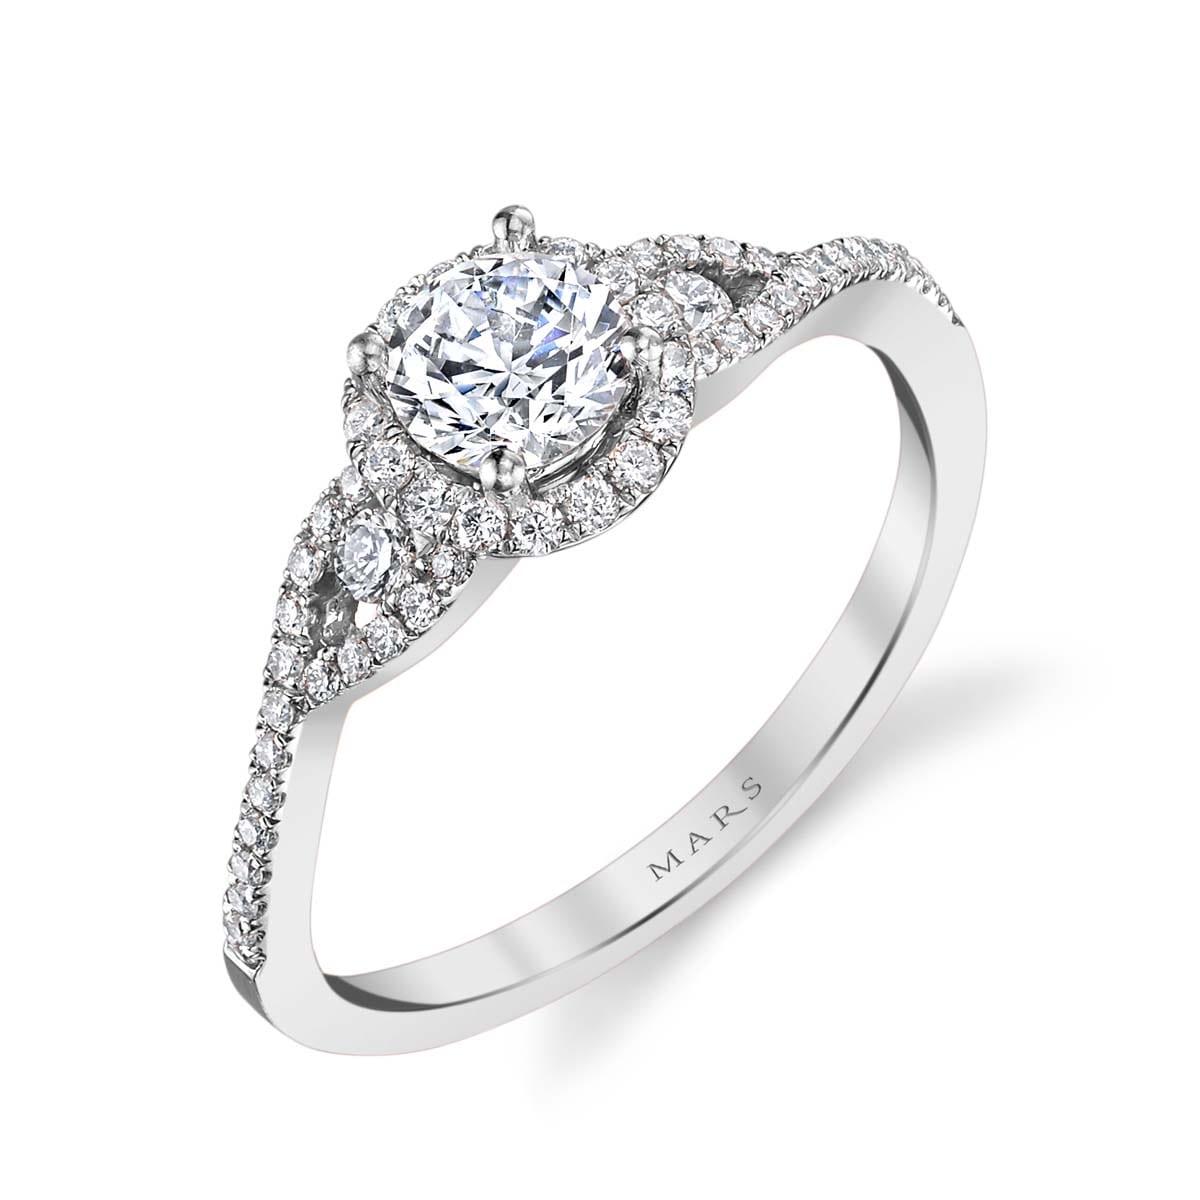 Halo Three-Stone Engagement Rings: MARKS-25386-PL